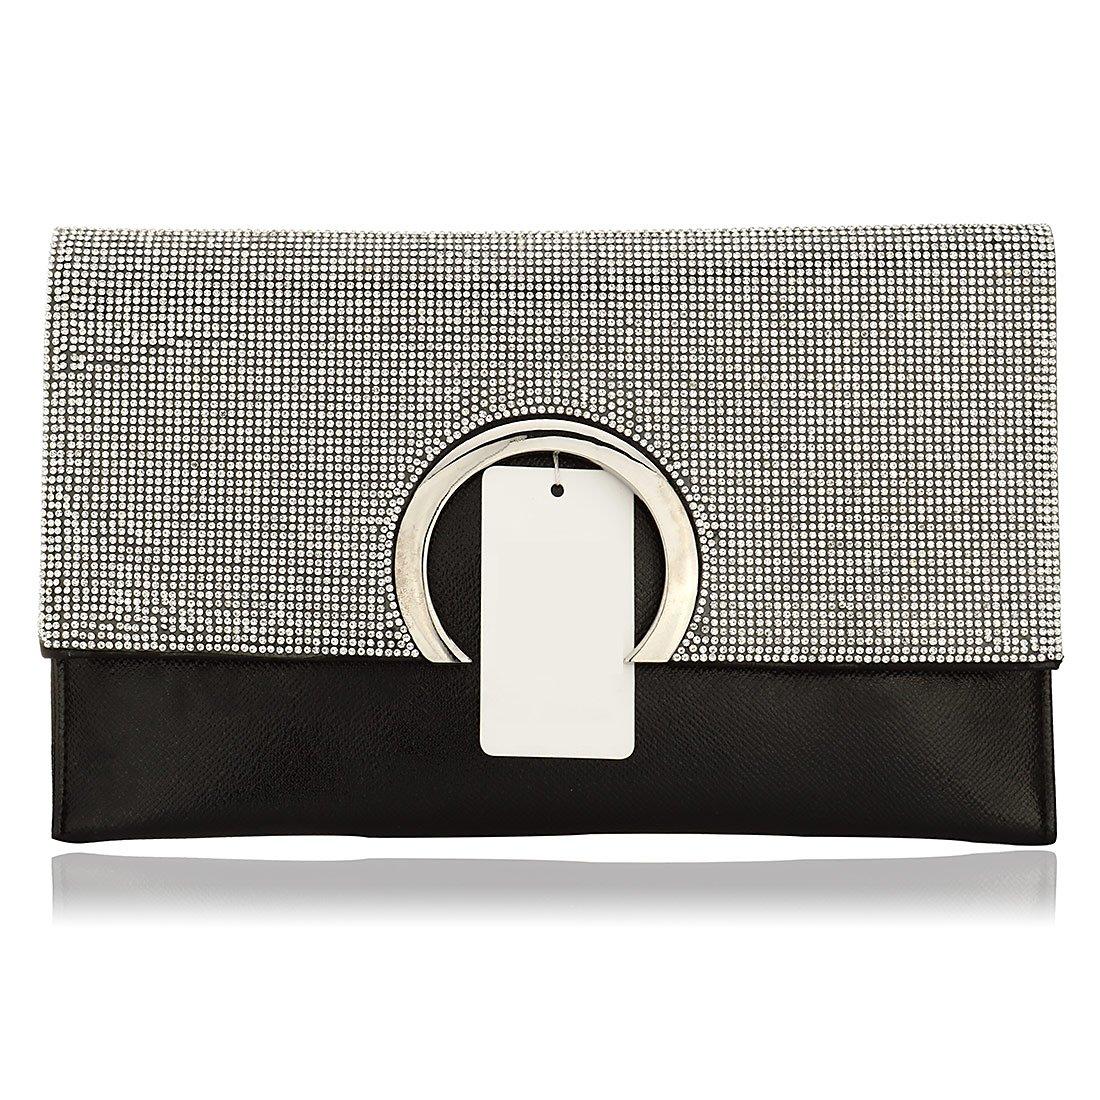 Evening Clutch Handbag, Cocktail Party Bridal Wedding Prom Clutch Purse Wallet Bag (Black)